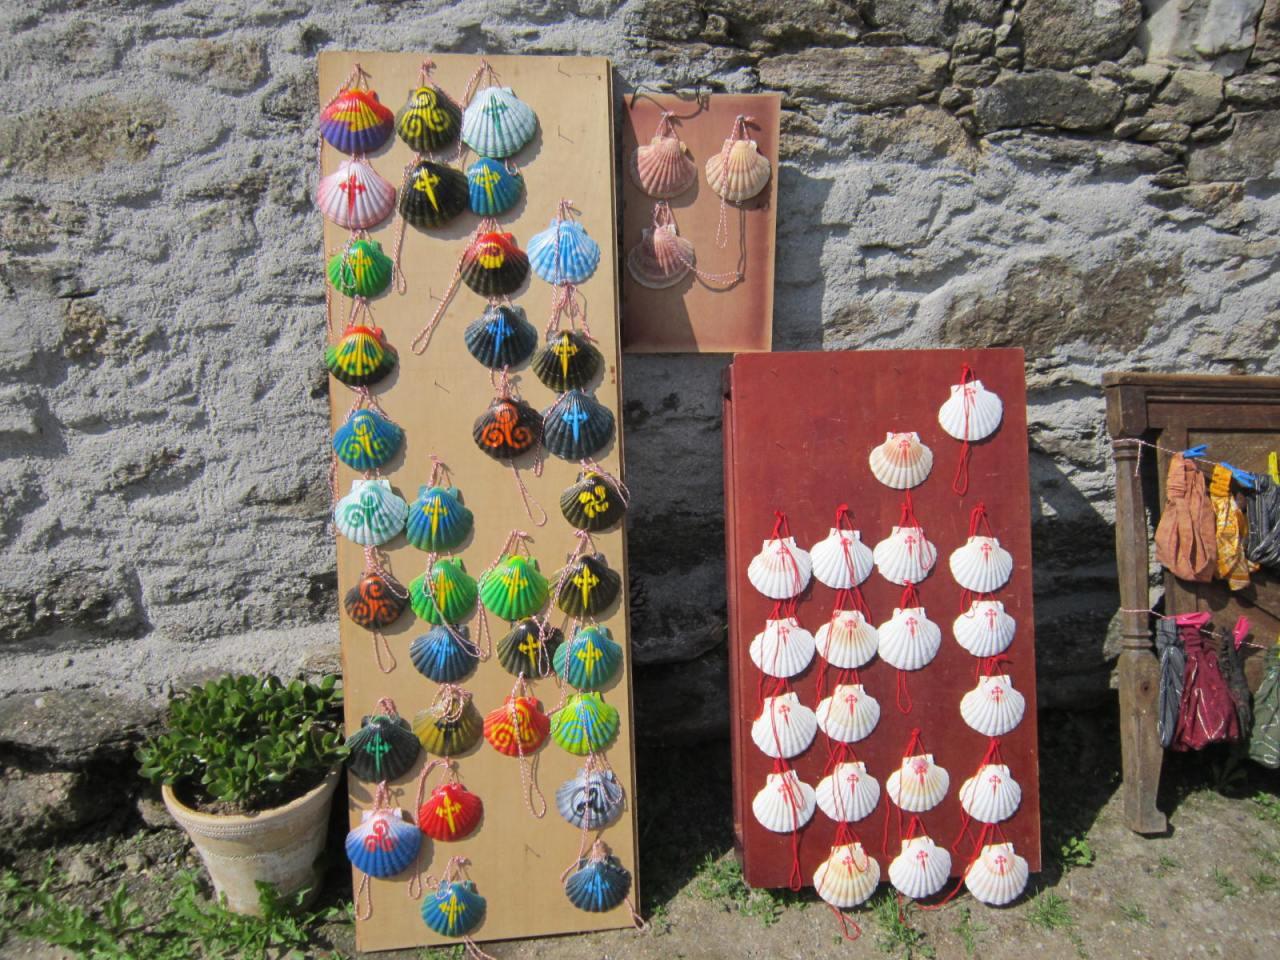 Camino Santiago Scallop shells